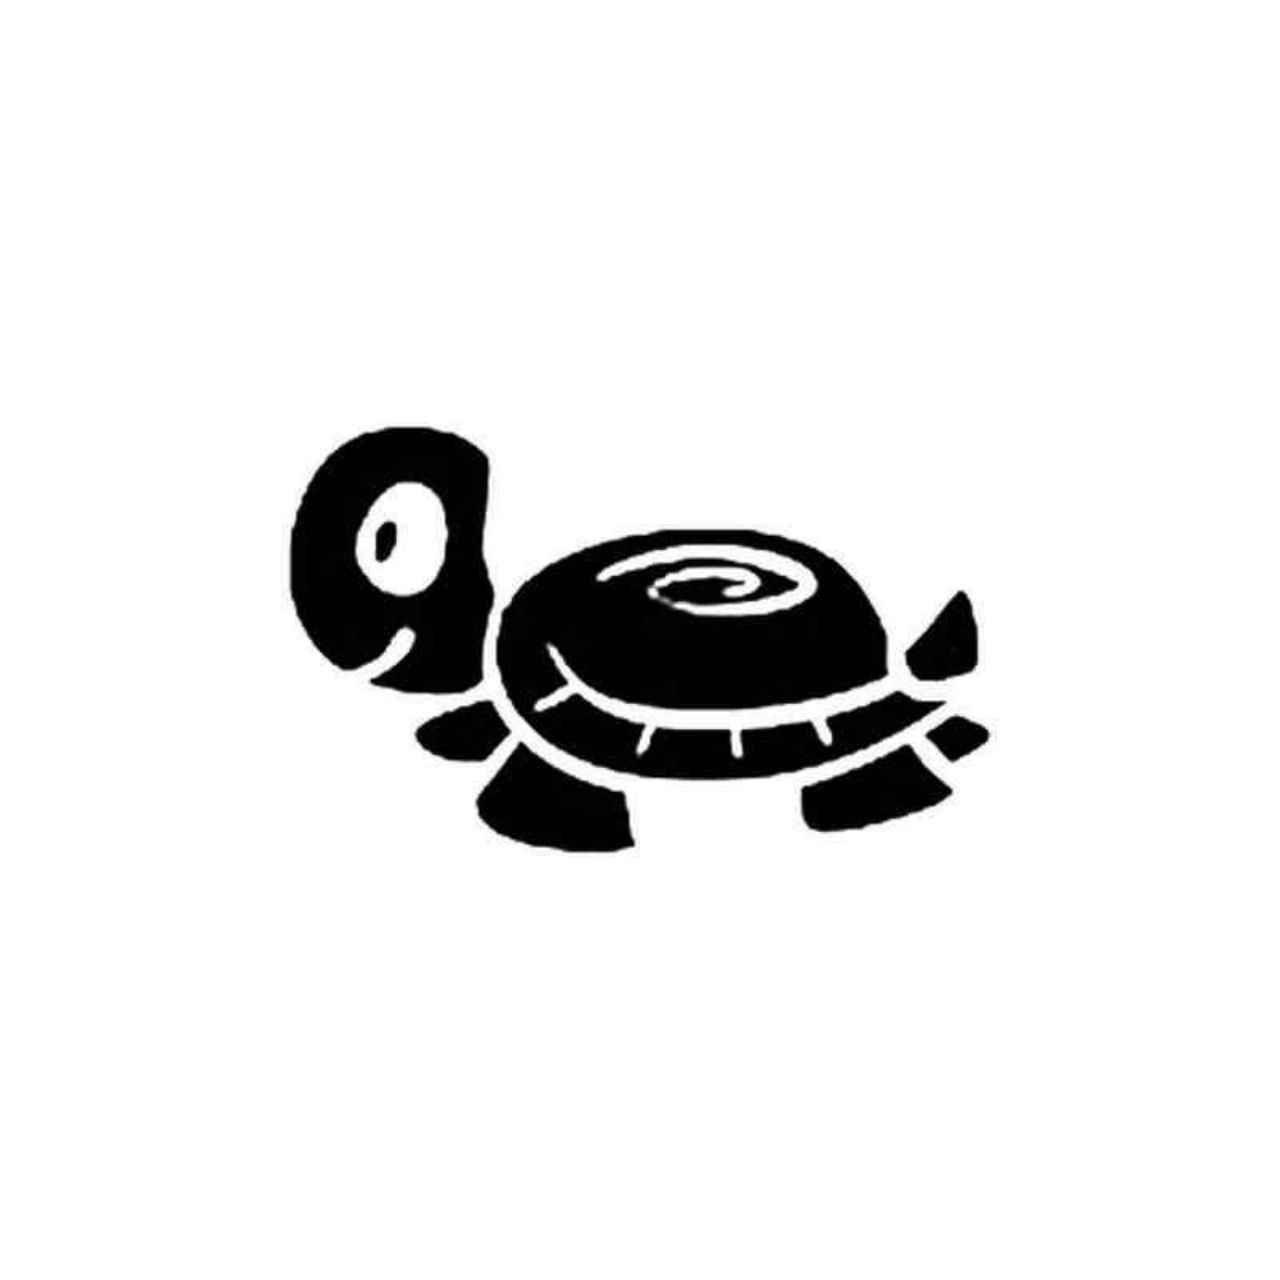 Turtle 65 Decal Sticker Ballzbeatz Com